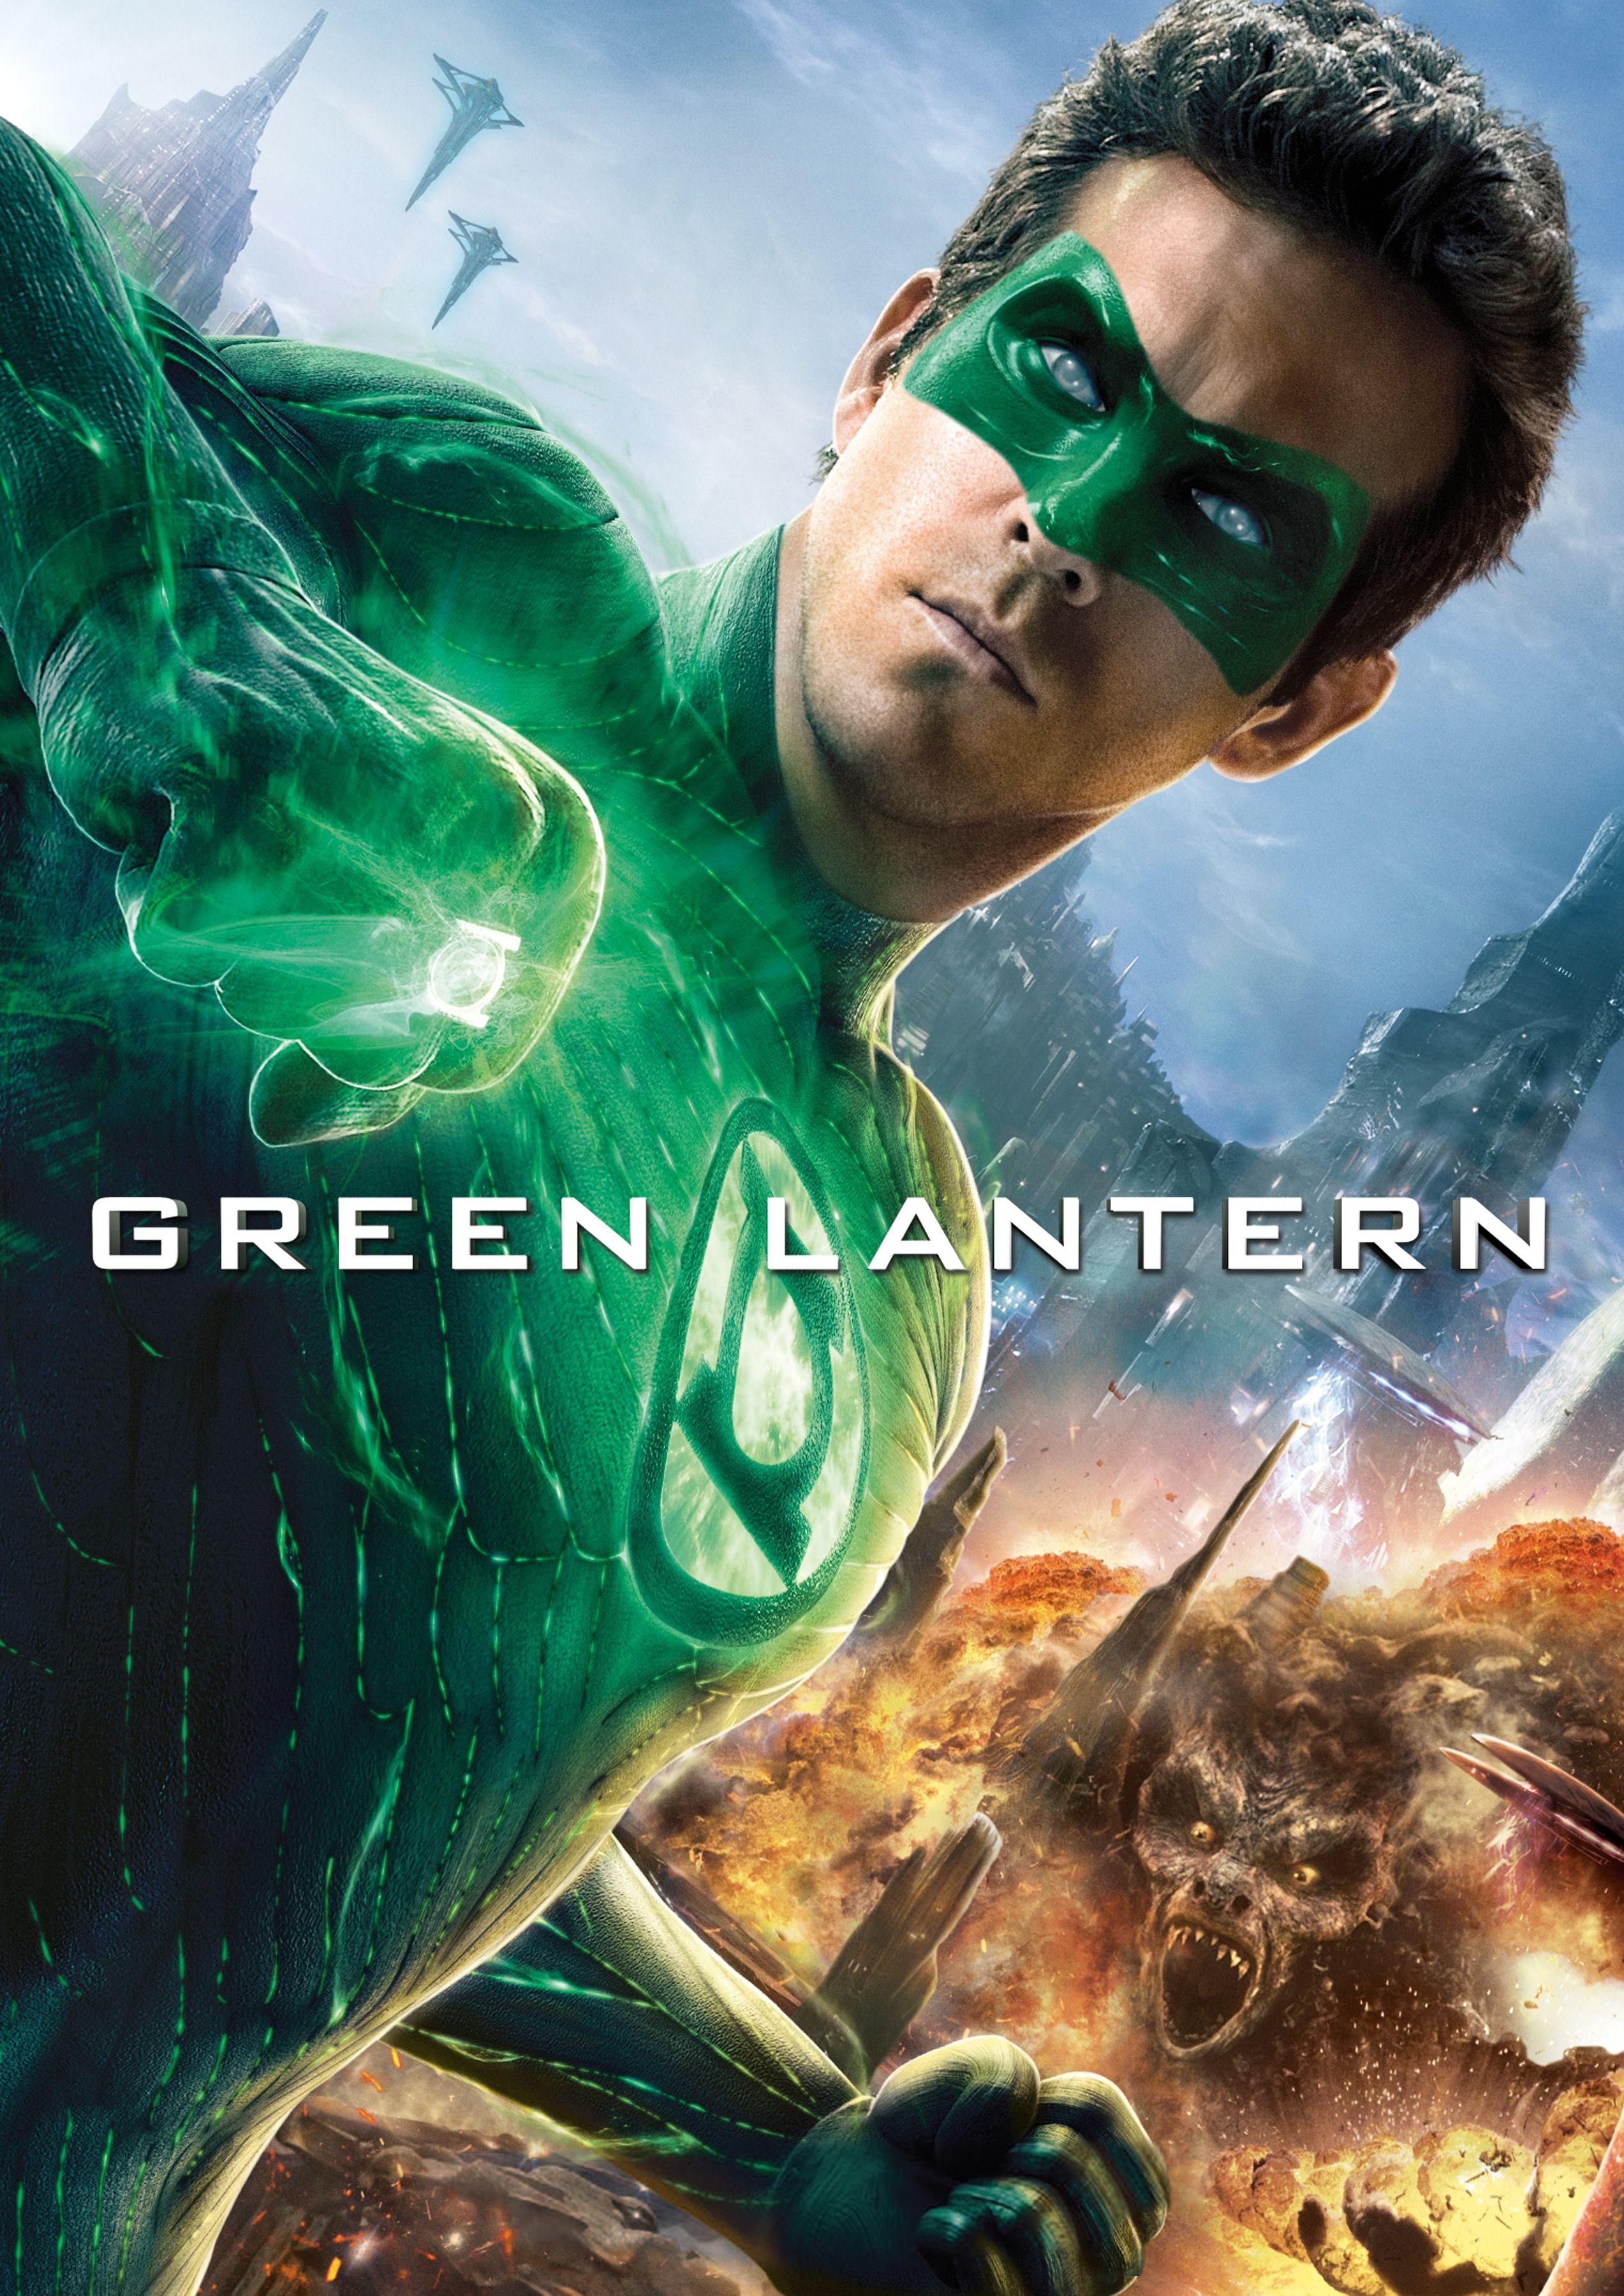 Green Lantern Green lantern movie, Green lantern, Green